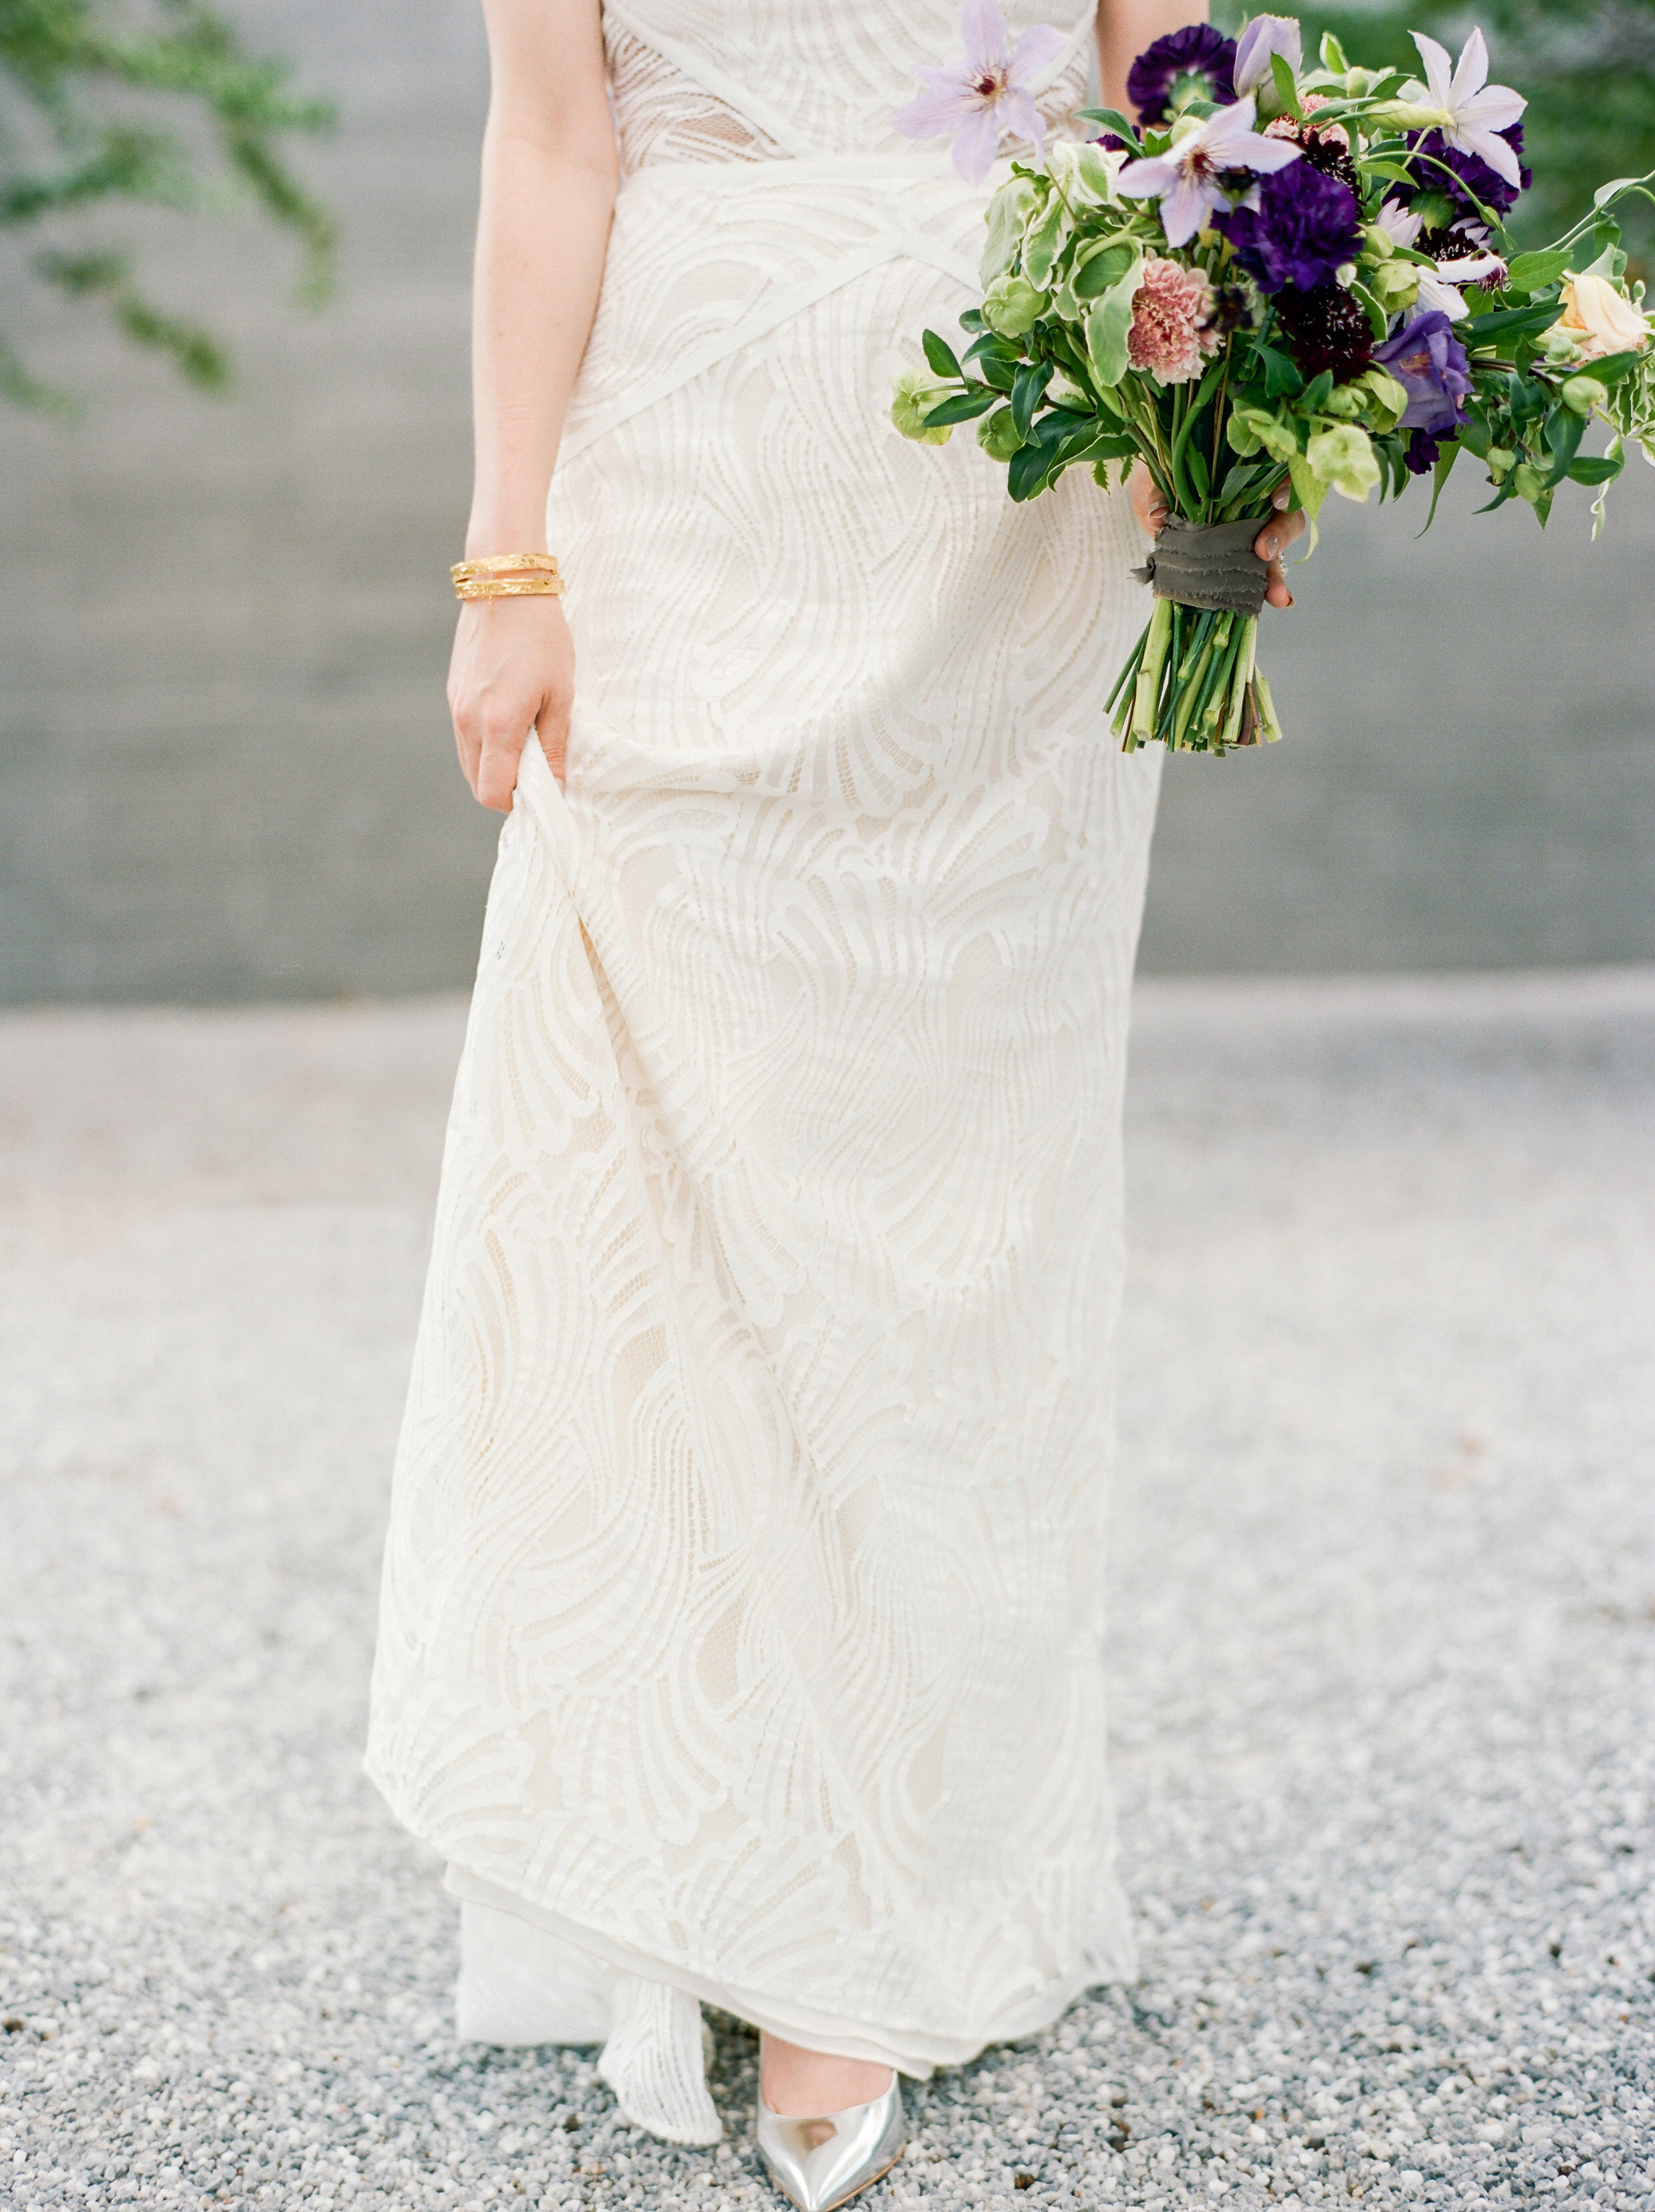 mcgovern-centennial-gardens-wedding-houston-wedding-photographer-bridals-film-austin-wedding-photographer-10.jpg